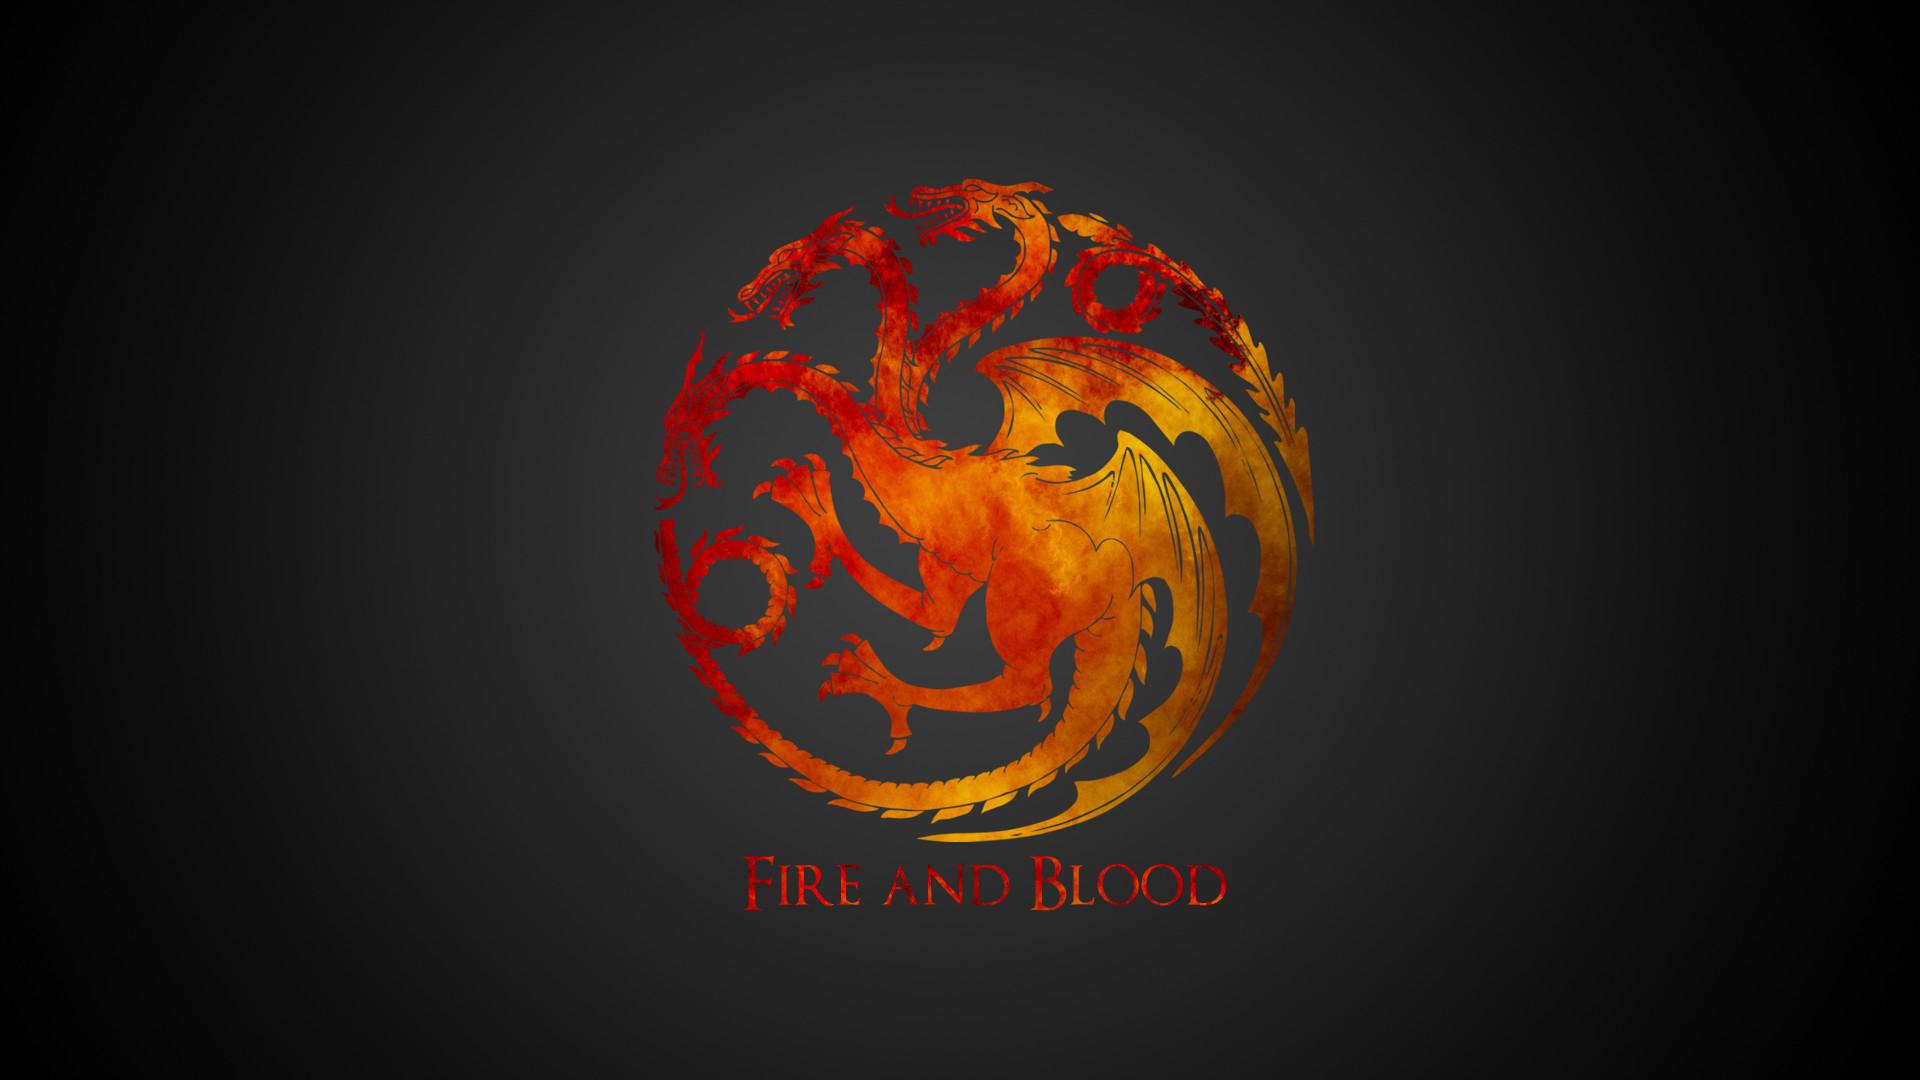 Game Of Thrones Quotes Mobile Wallpaper House Targaryen Wallpaper 72 Images